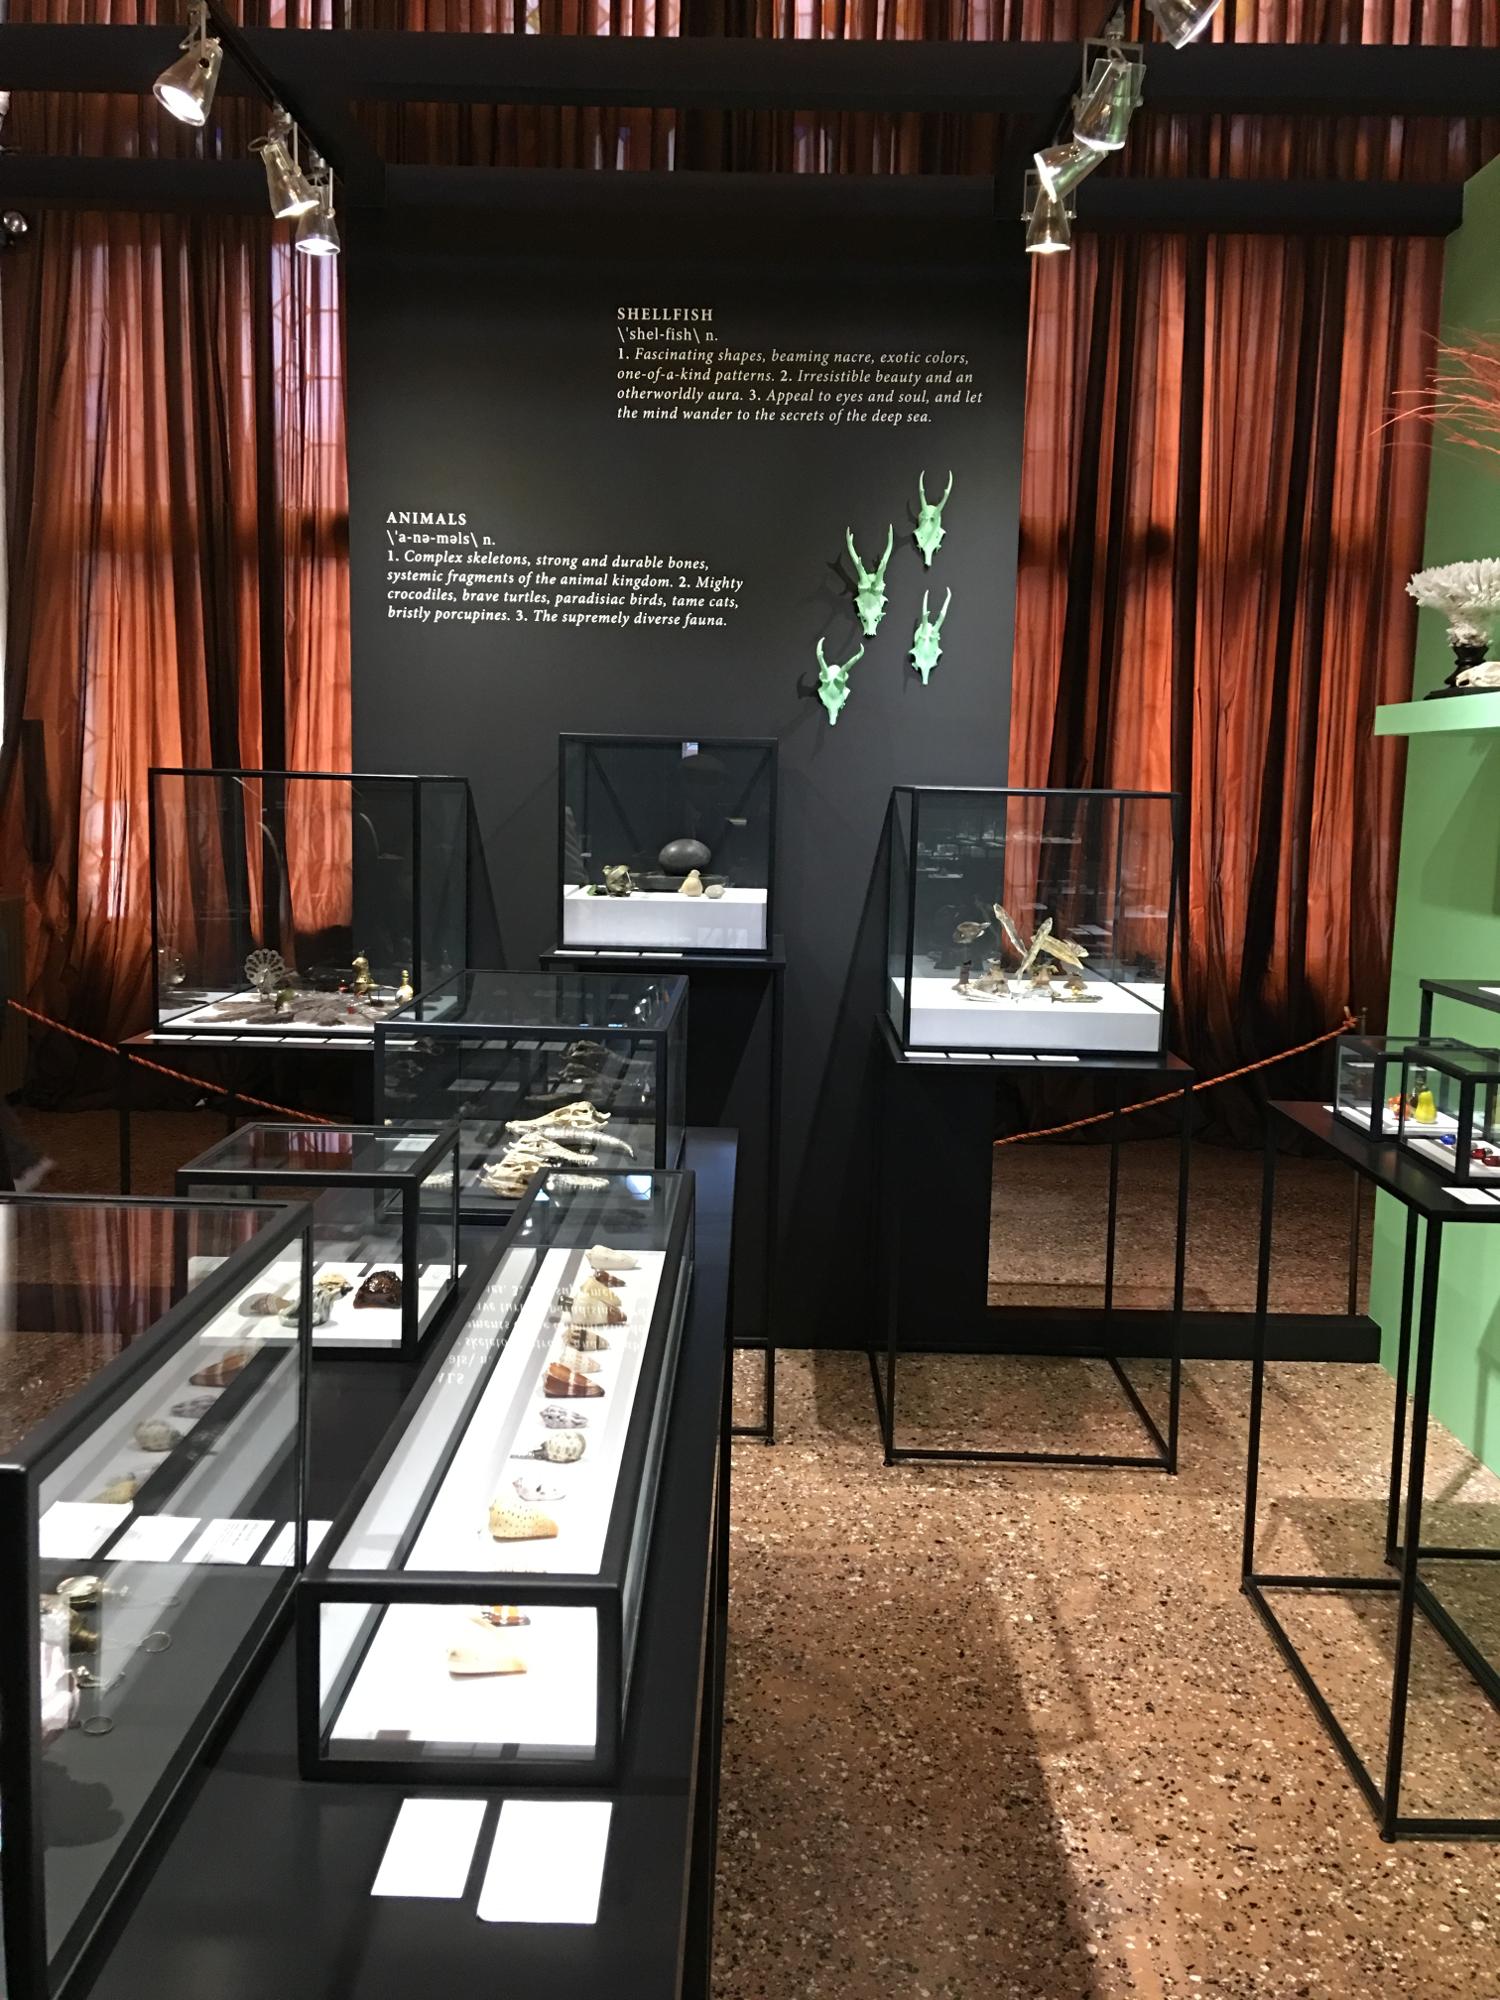 rocaille-blog-venezia-palazzo-mocenigo-cabinet-of-curiosities-collezione-storp-profumo-21